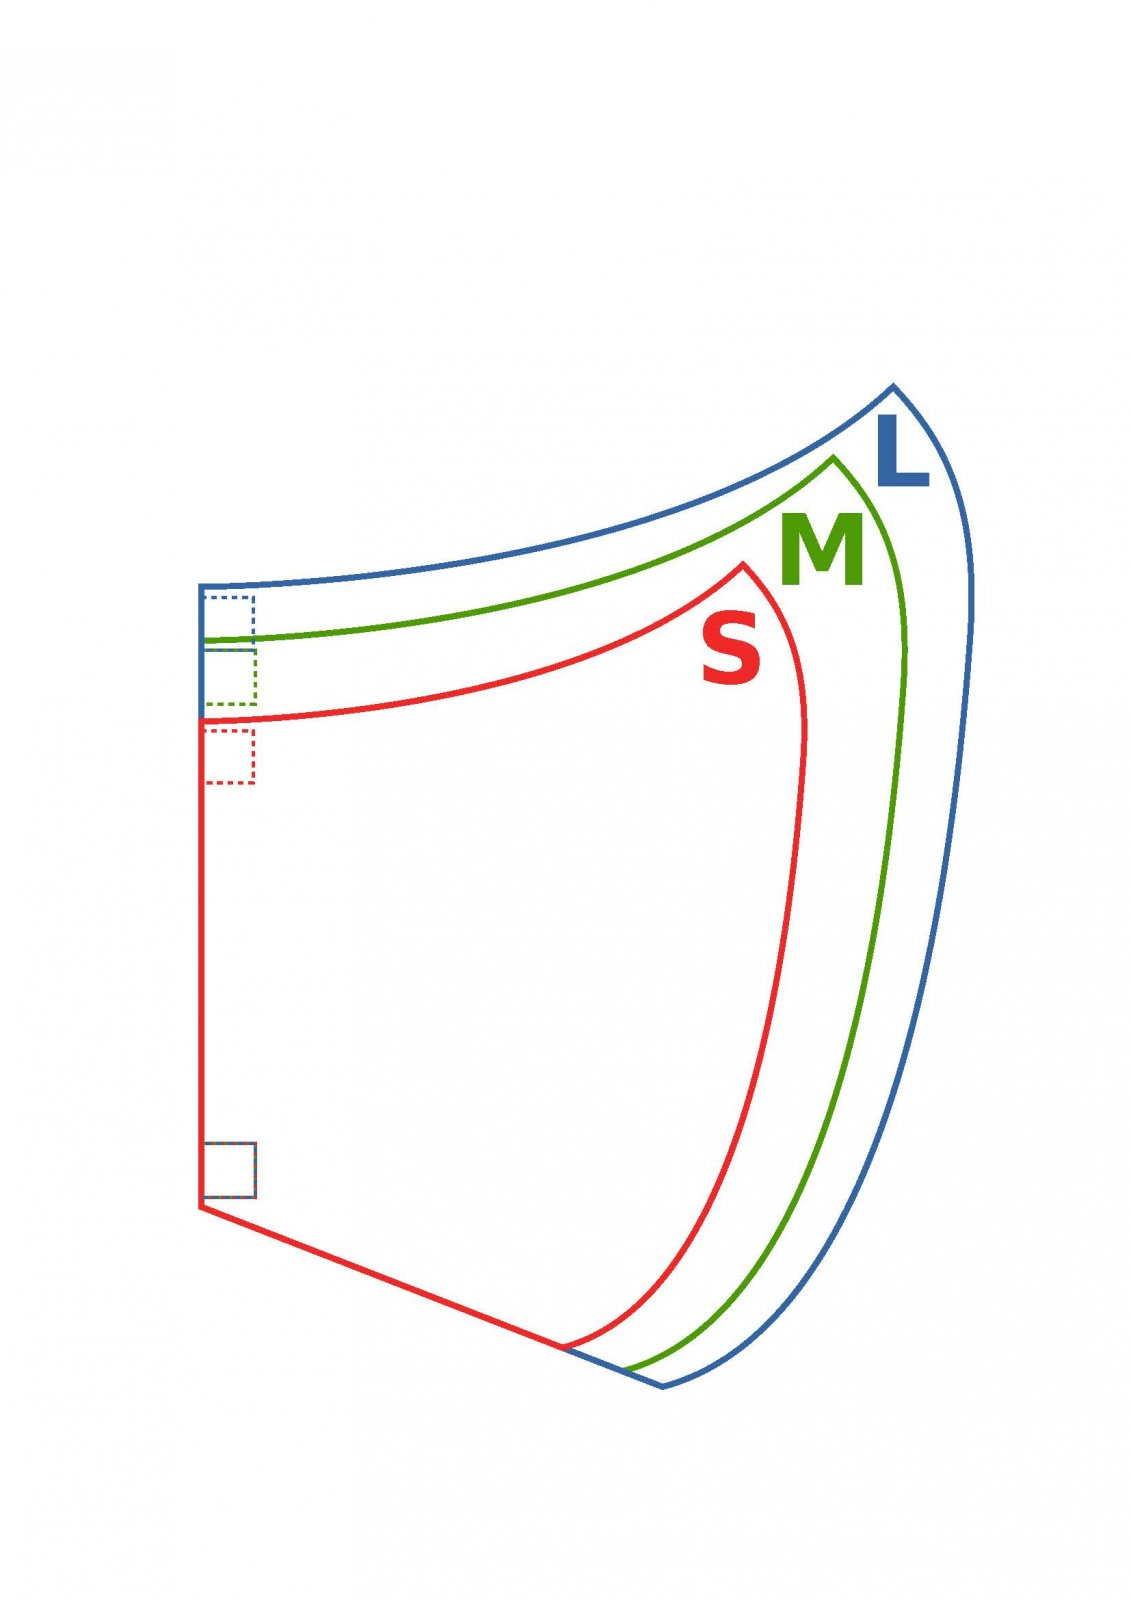 Duckbill Sizes - Use Duckbill Pattern